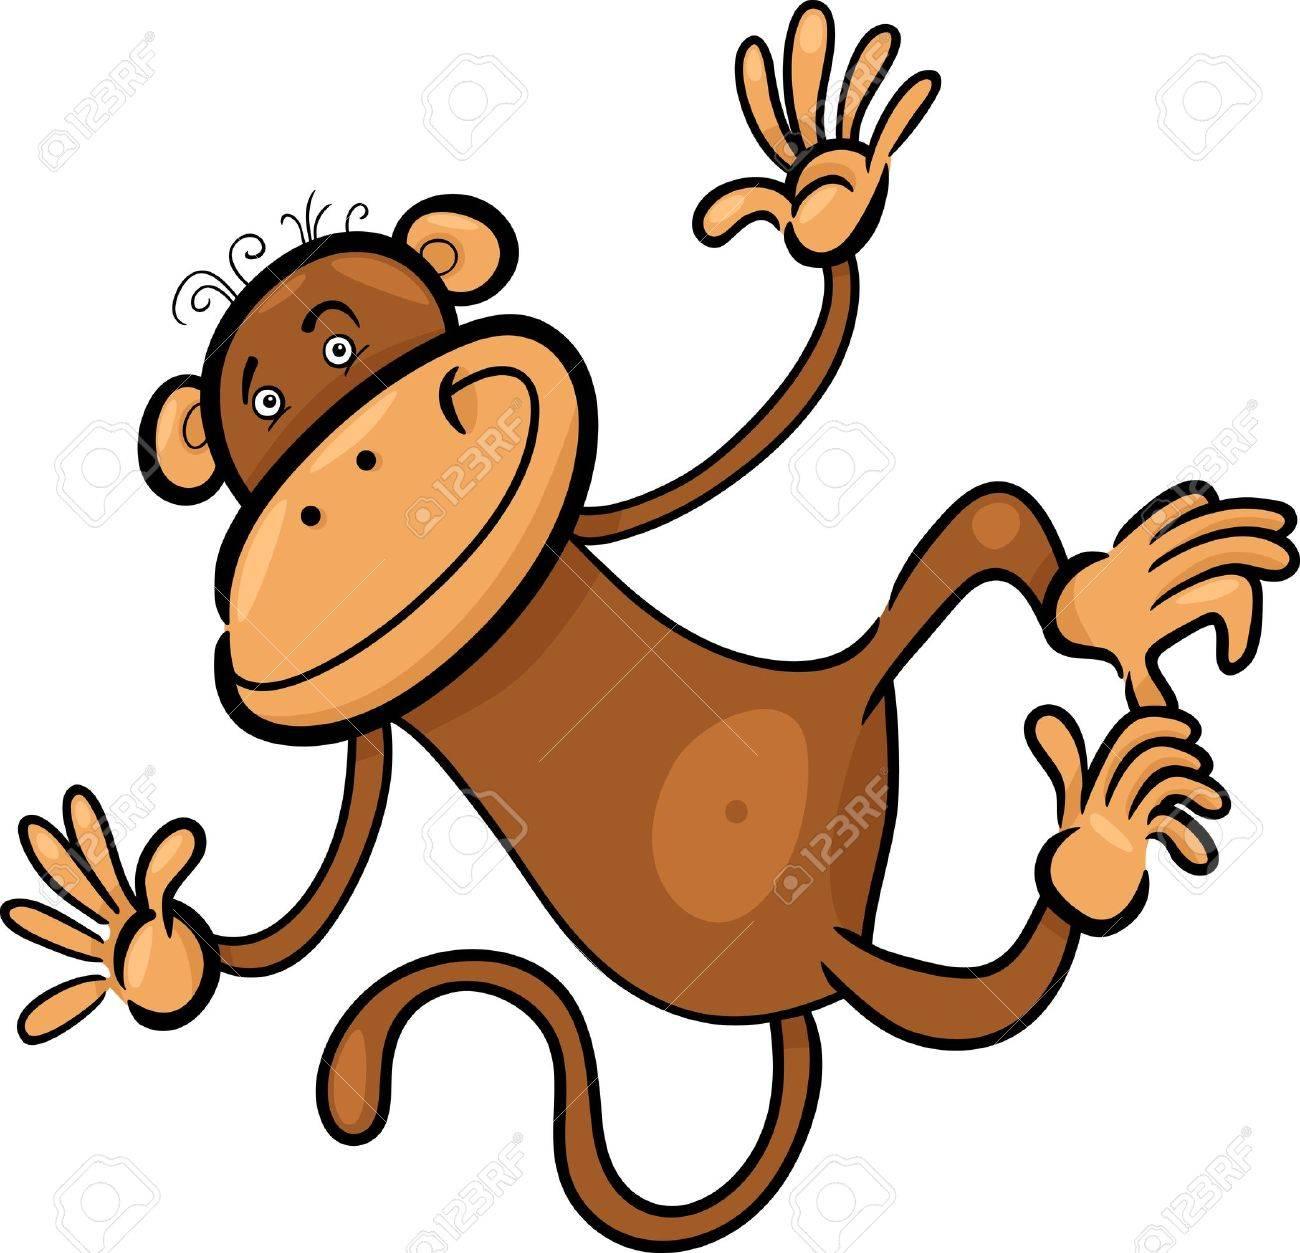 Cartoon Humorous Illustration of Cute Funny Monkey Stock Vector - 14965327